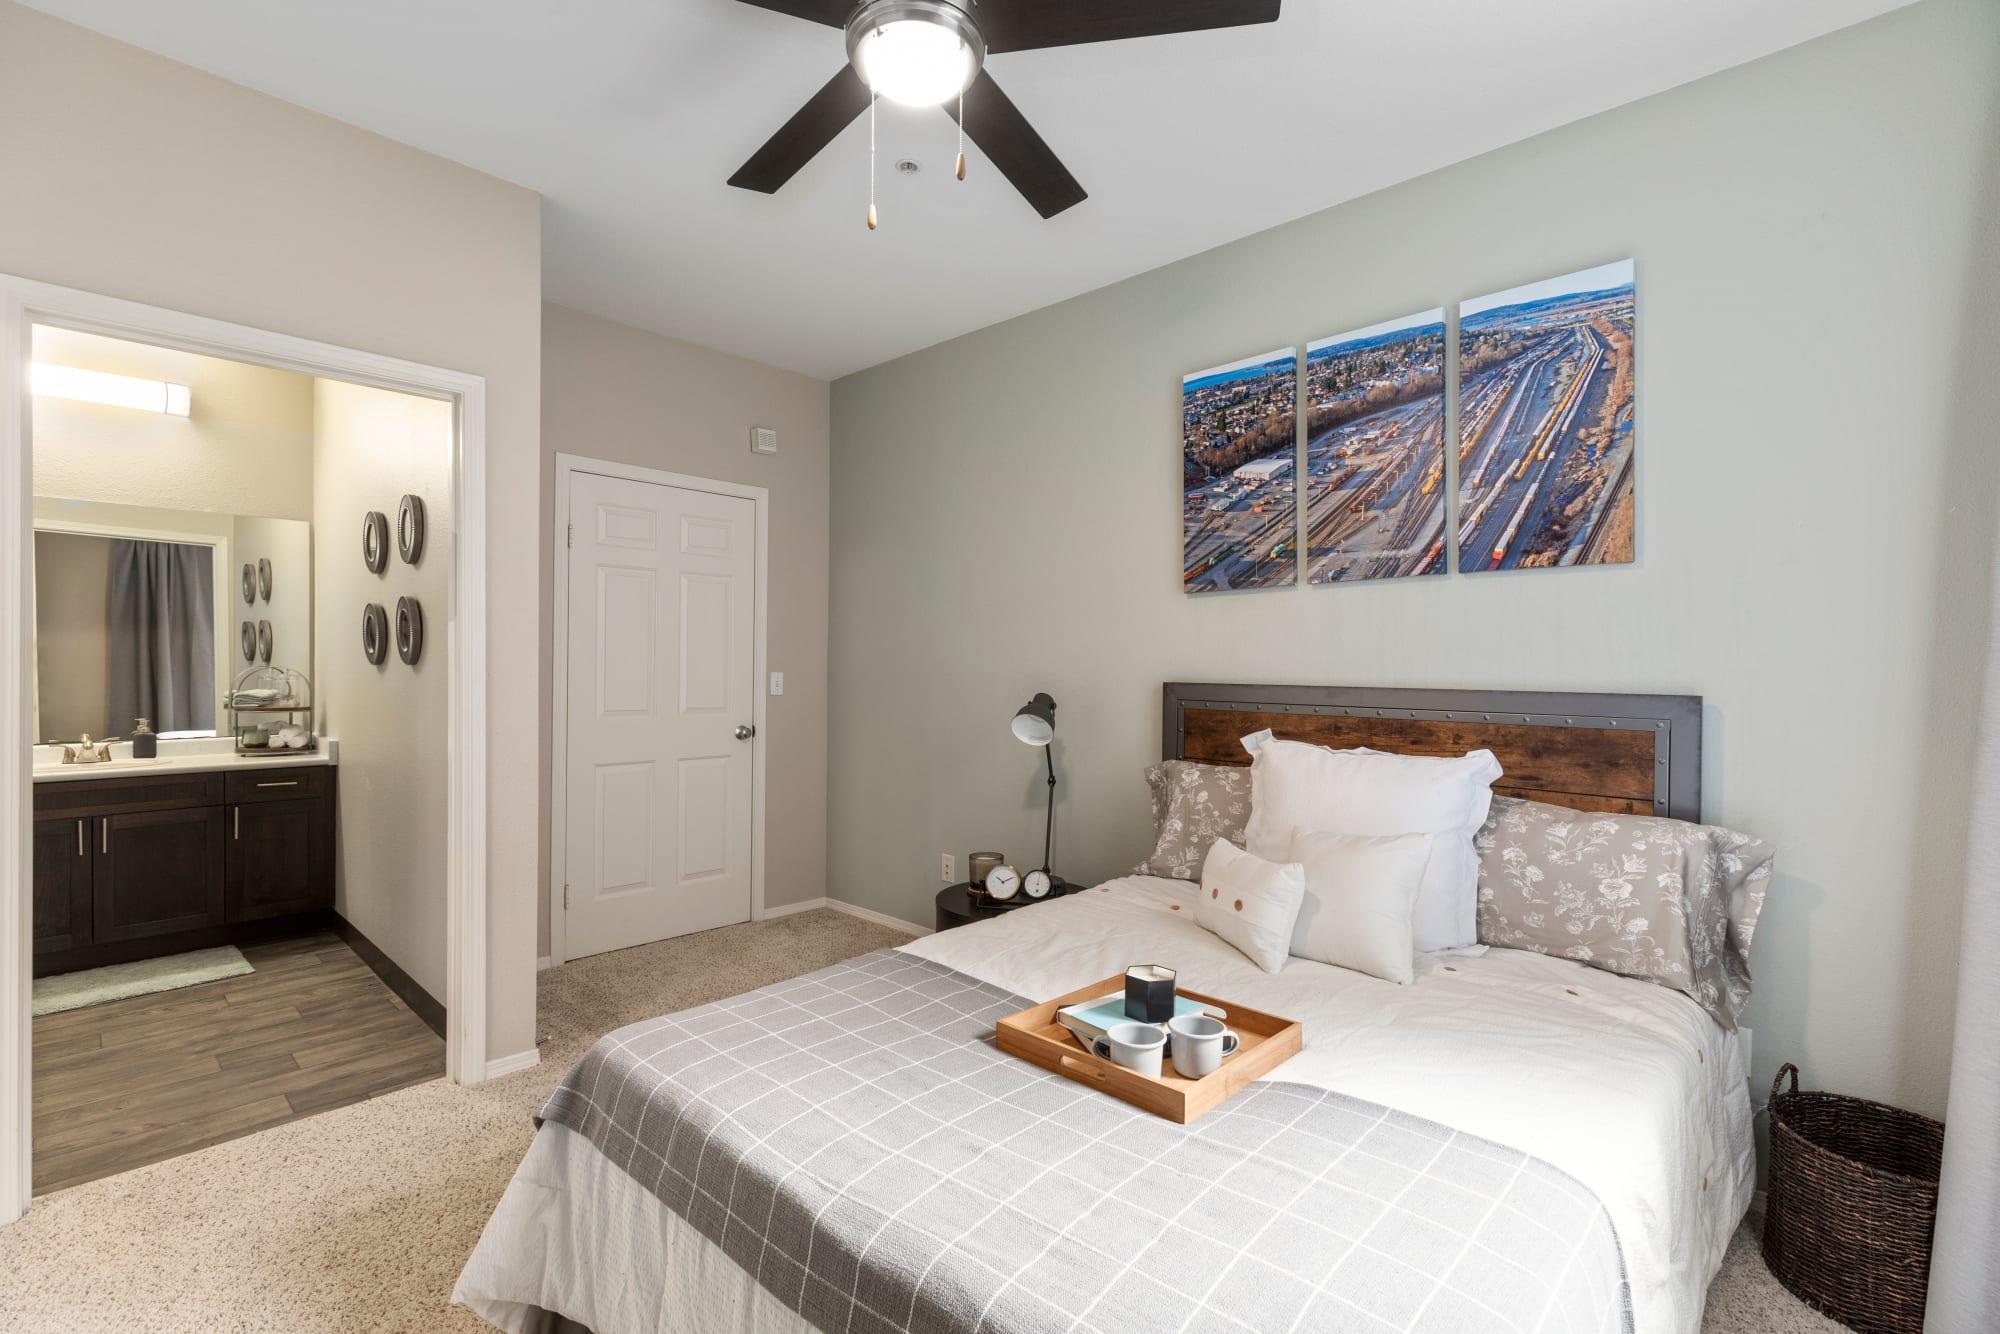 A spacious bedroom at HighGrove Apartments in Everett, Washington